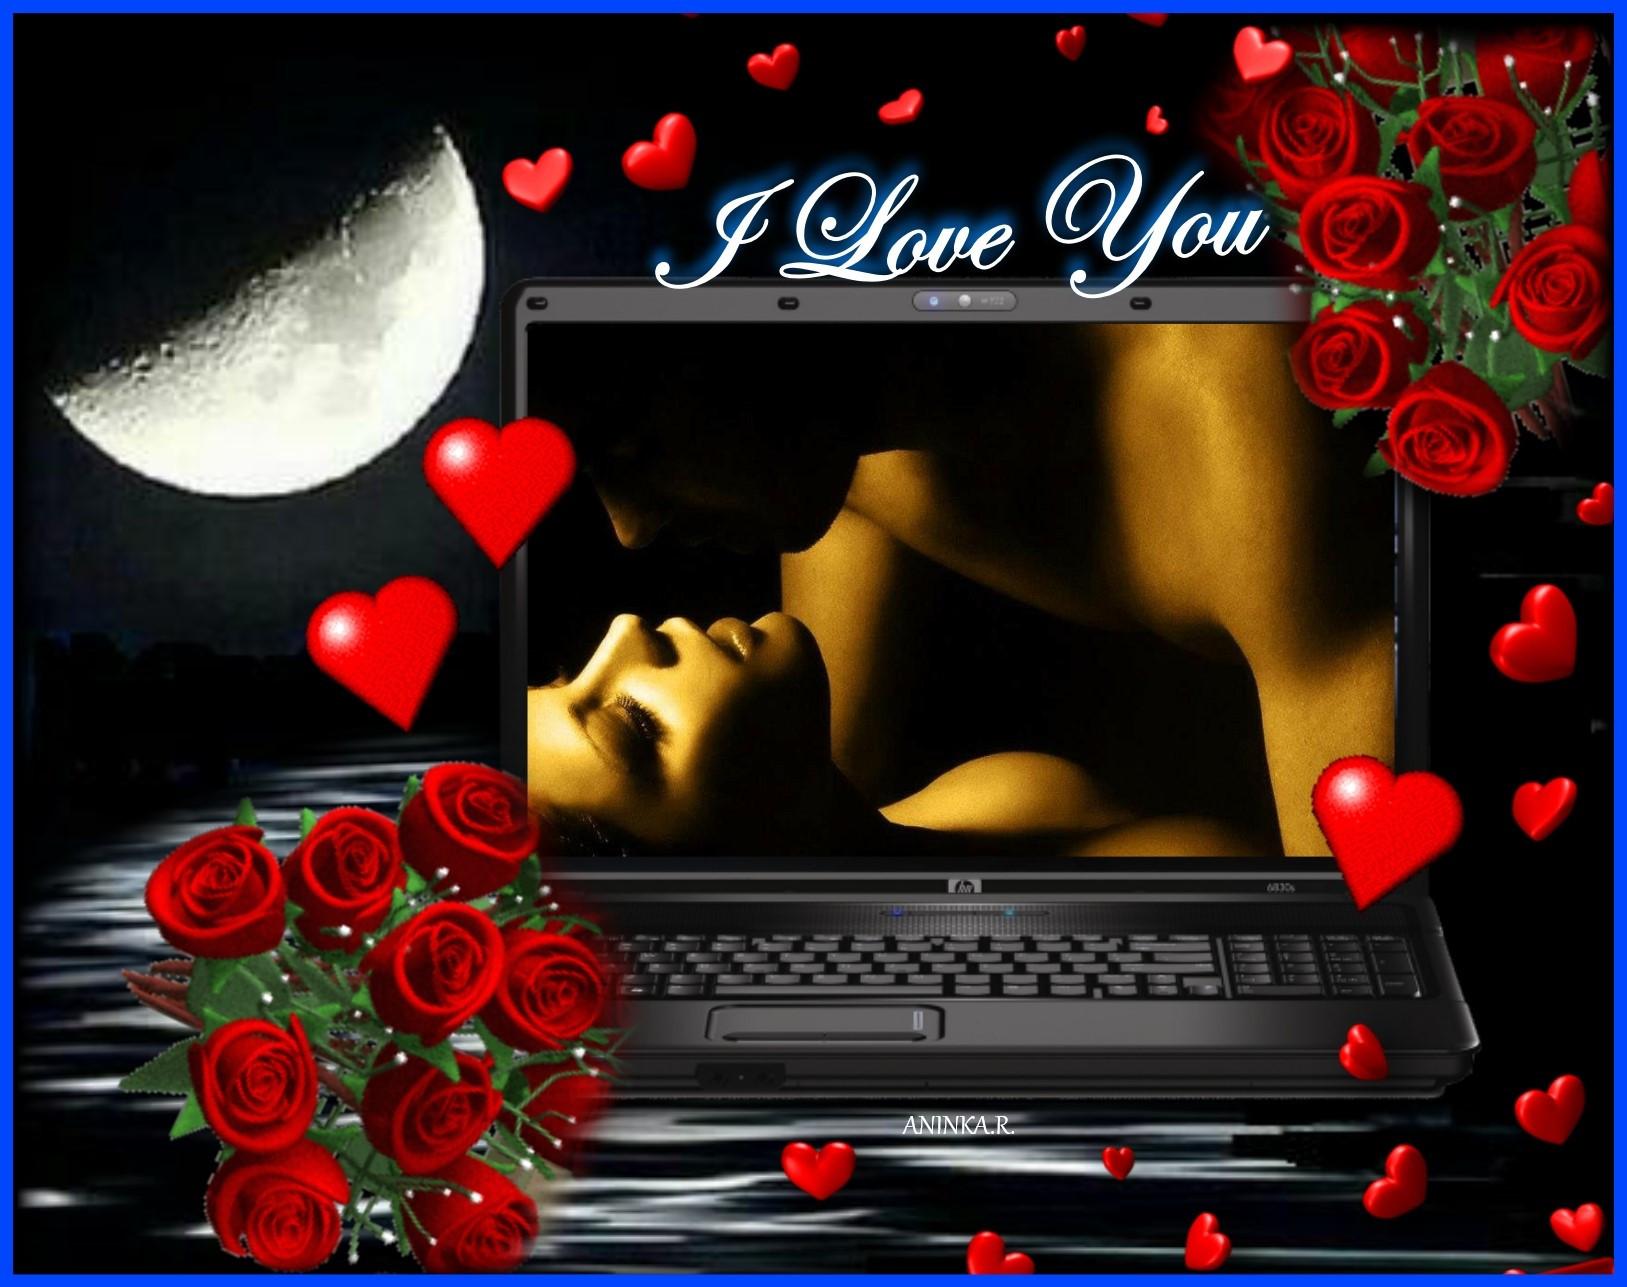 P-C-Love-Miminko58-iLoveYou.jpg